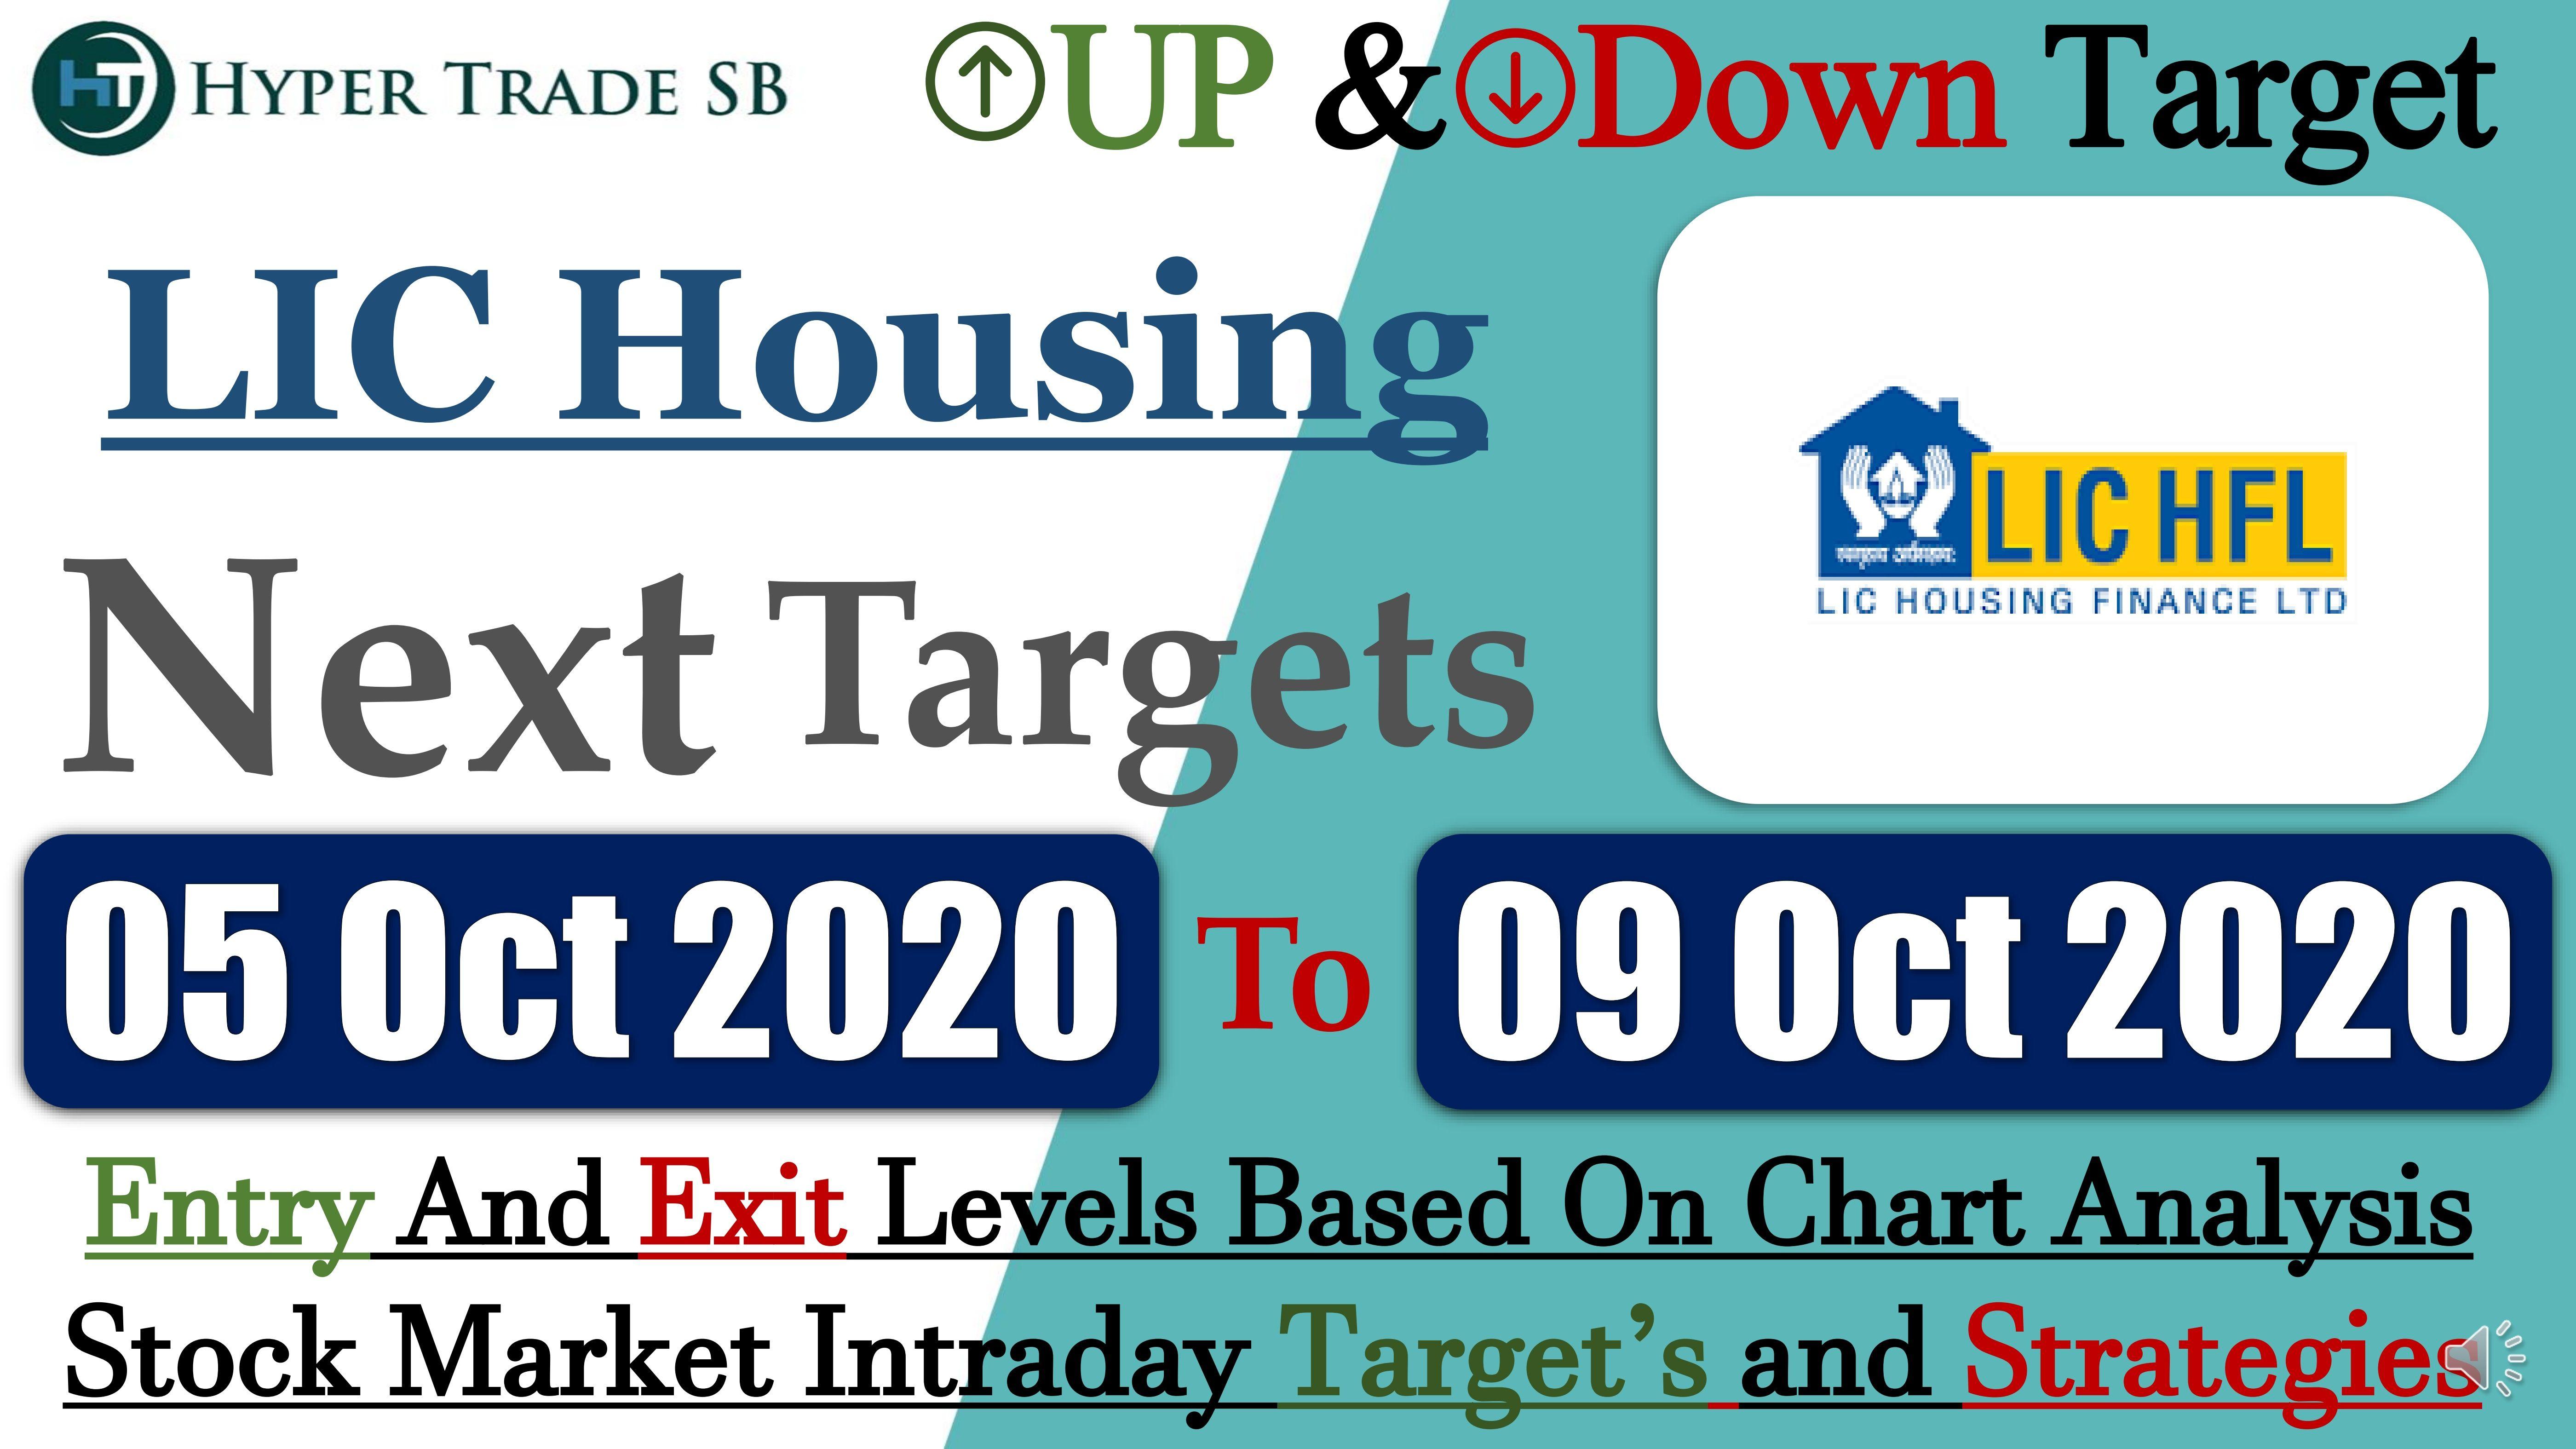 Lic Housing Finance Share 05 Oct Lic Intraday Tips Lic Stock Latest News Lic Intraday Targets Finance Stock Market Education